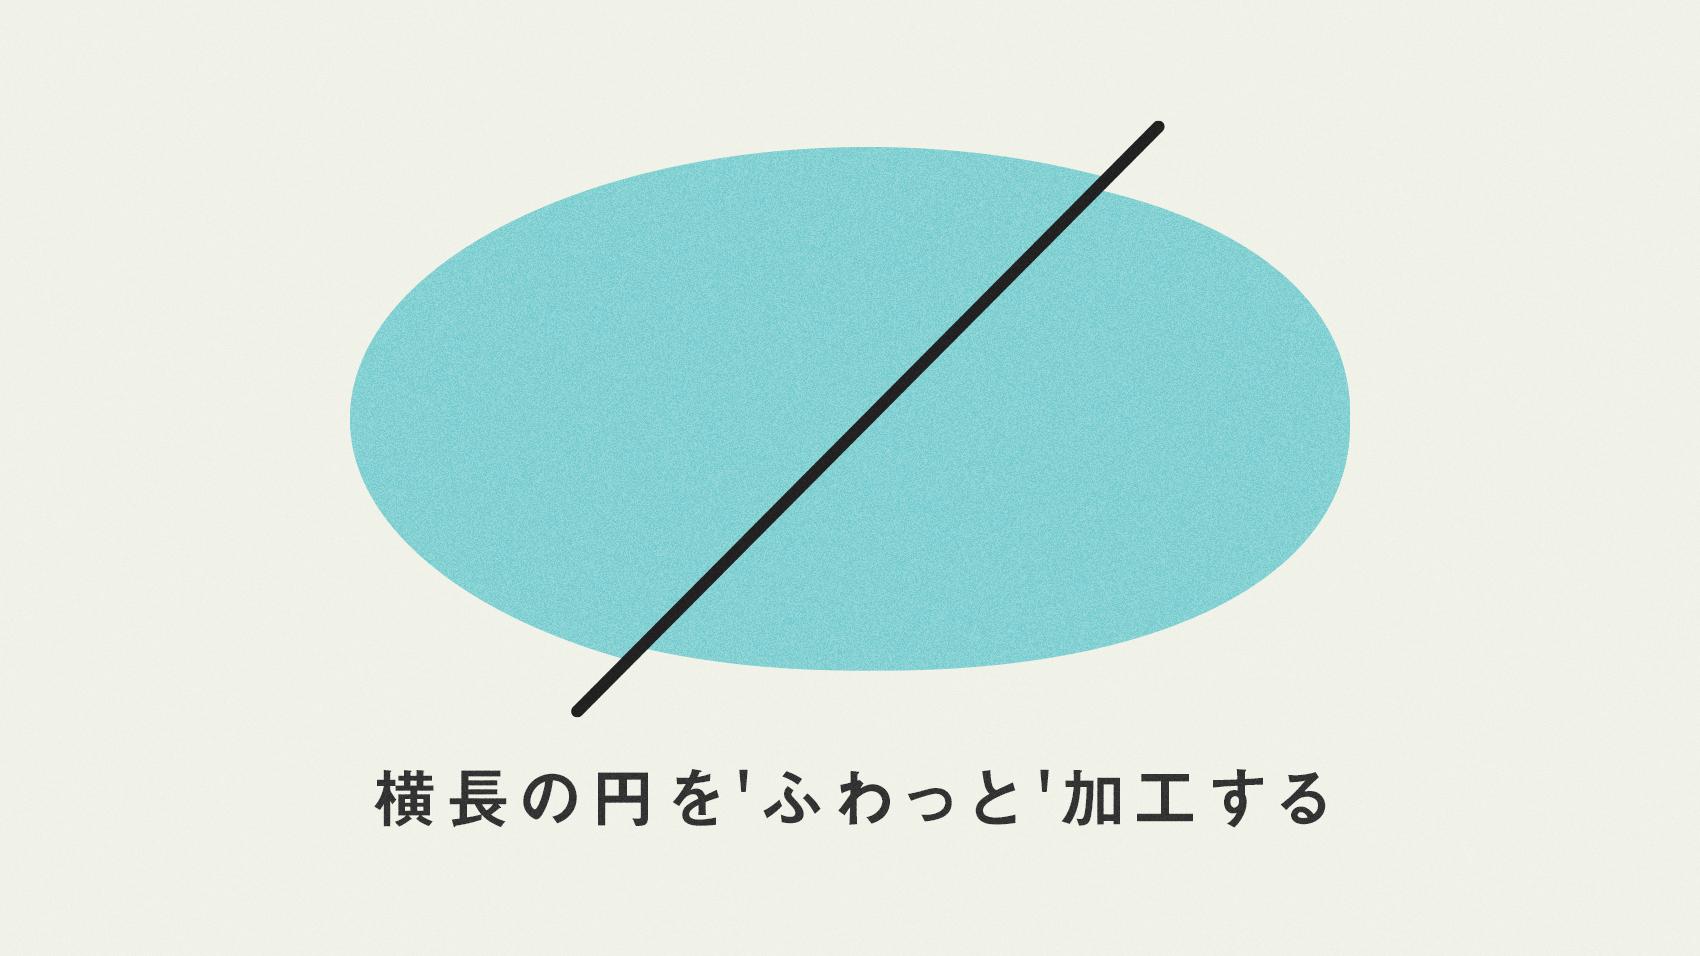 illustratorで横長の円形オブジェクトをふわっと変形させる方法